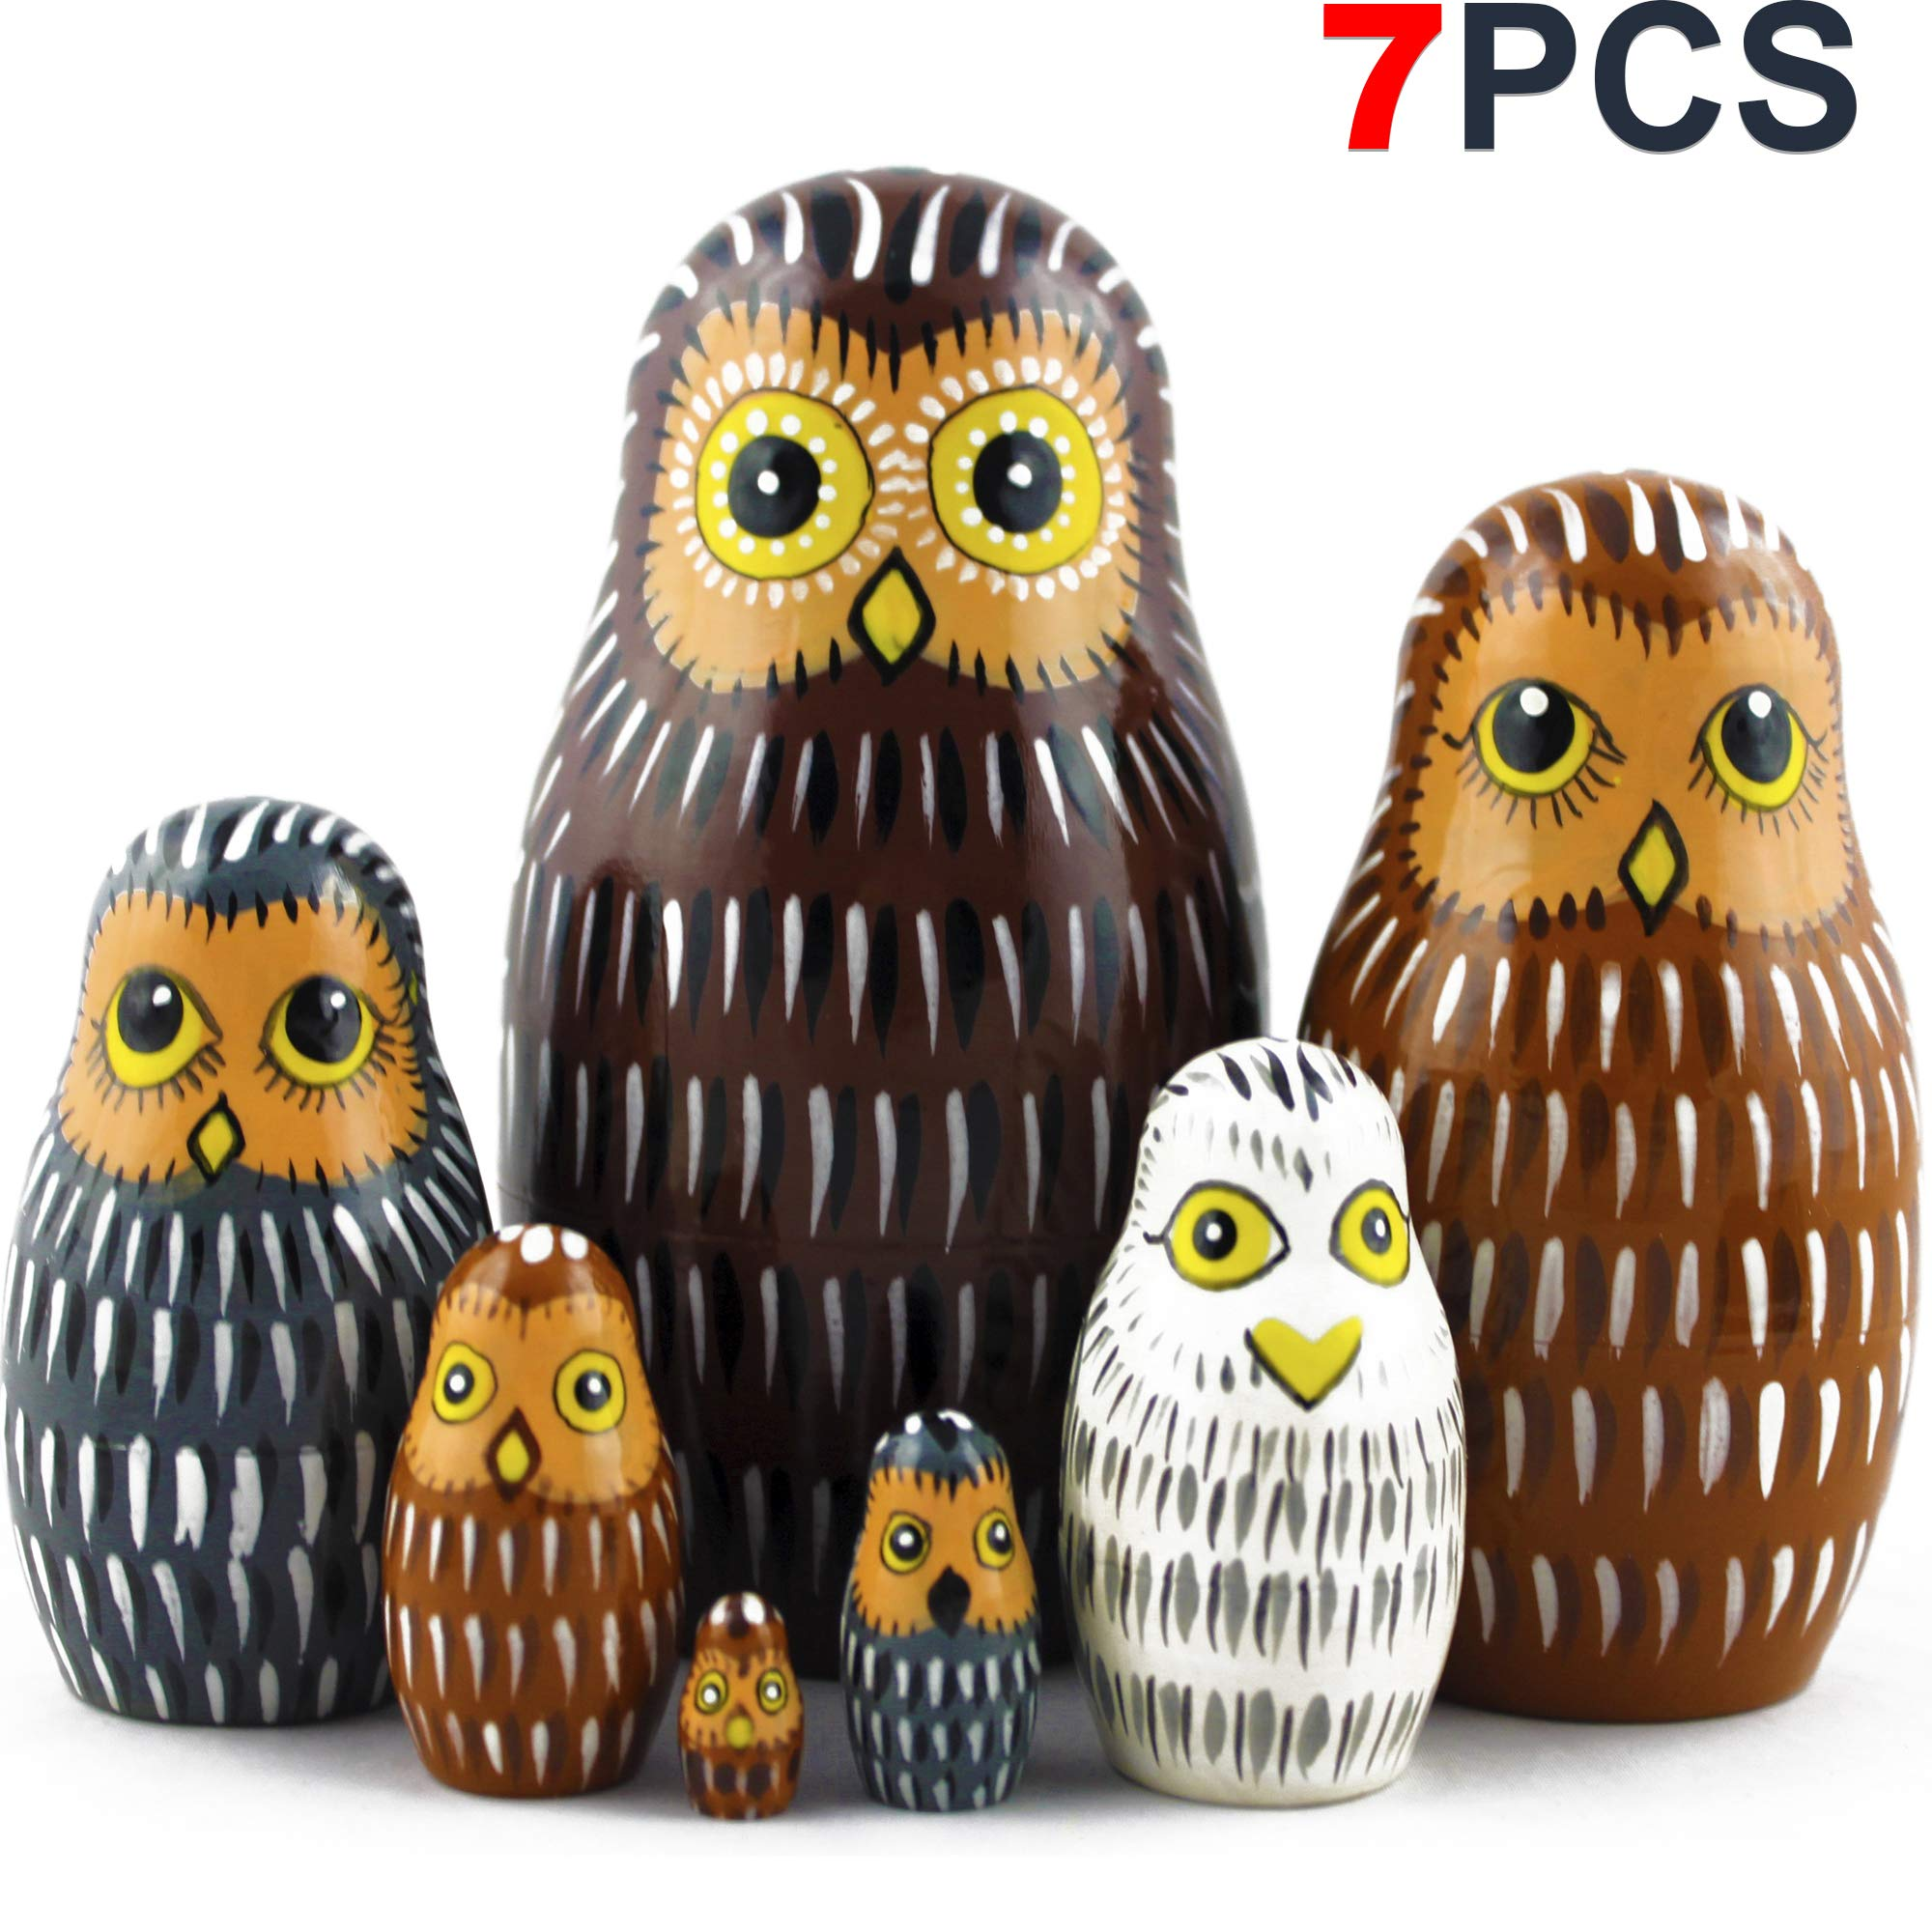 Owl Nesting Dolls - Owl Decor - Owl Gifts - Owl Toy - Matryoshka set 7 dolls by MATRYOSHKA&HANDICRAFT (Image #1)